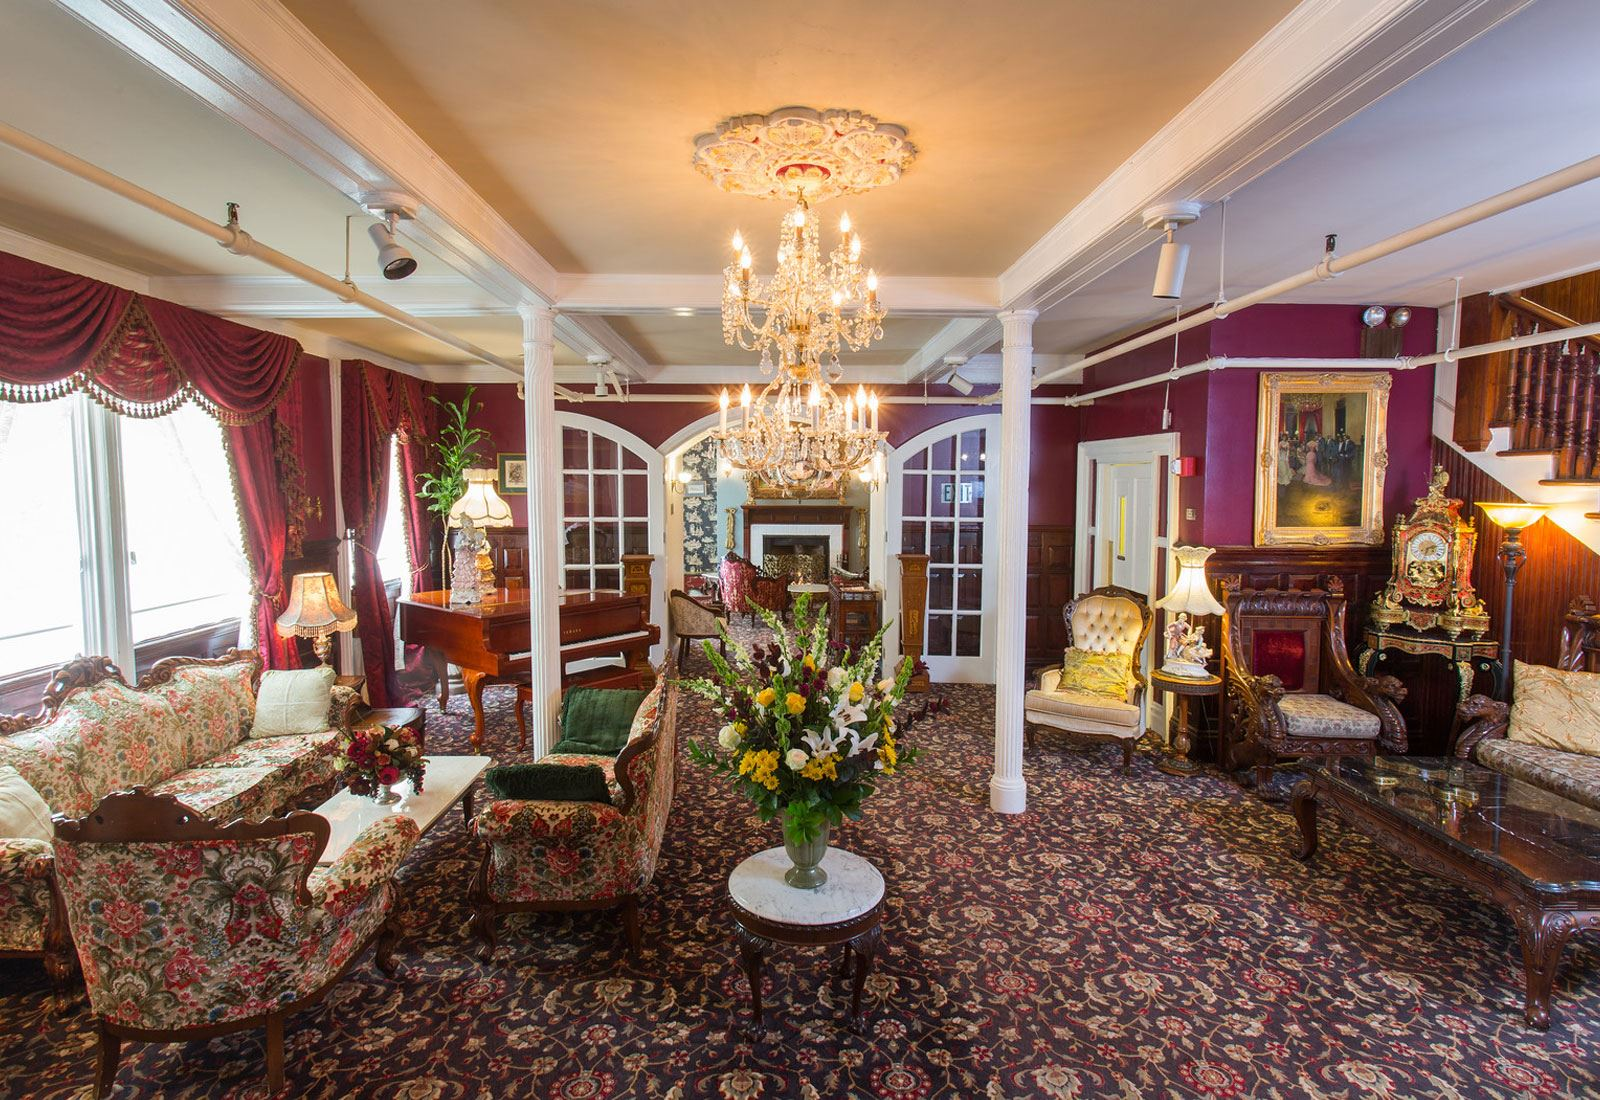 San Francisco Hotel Photos - Queen Anne Hotel